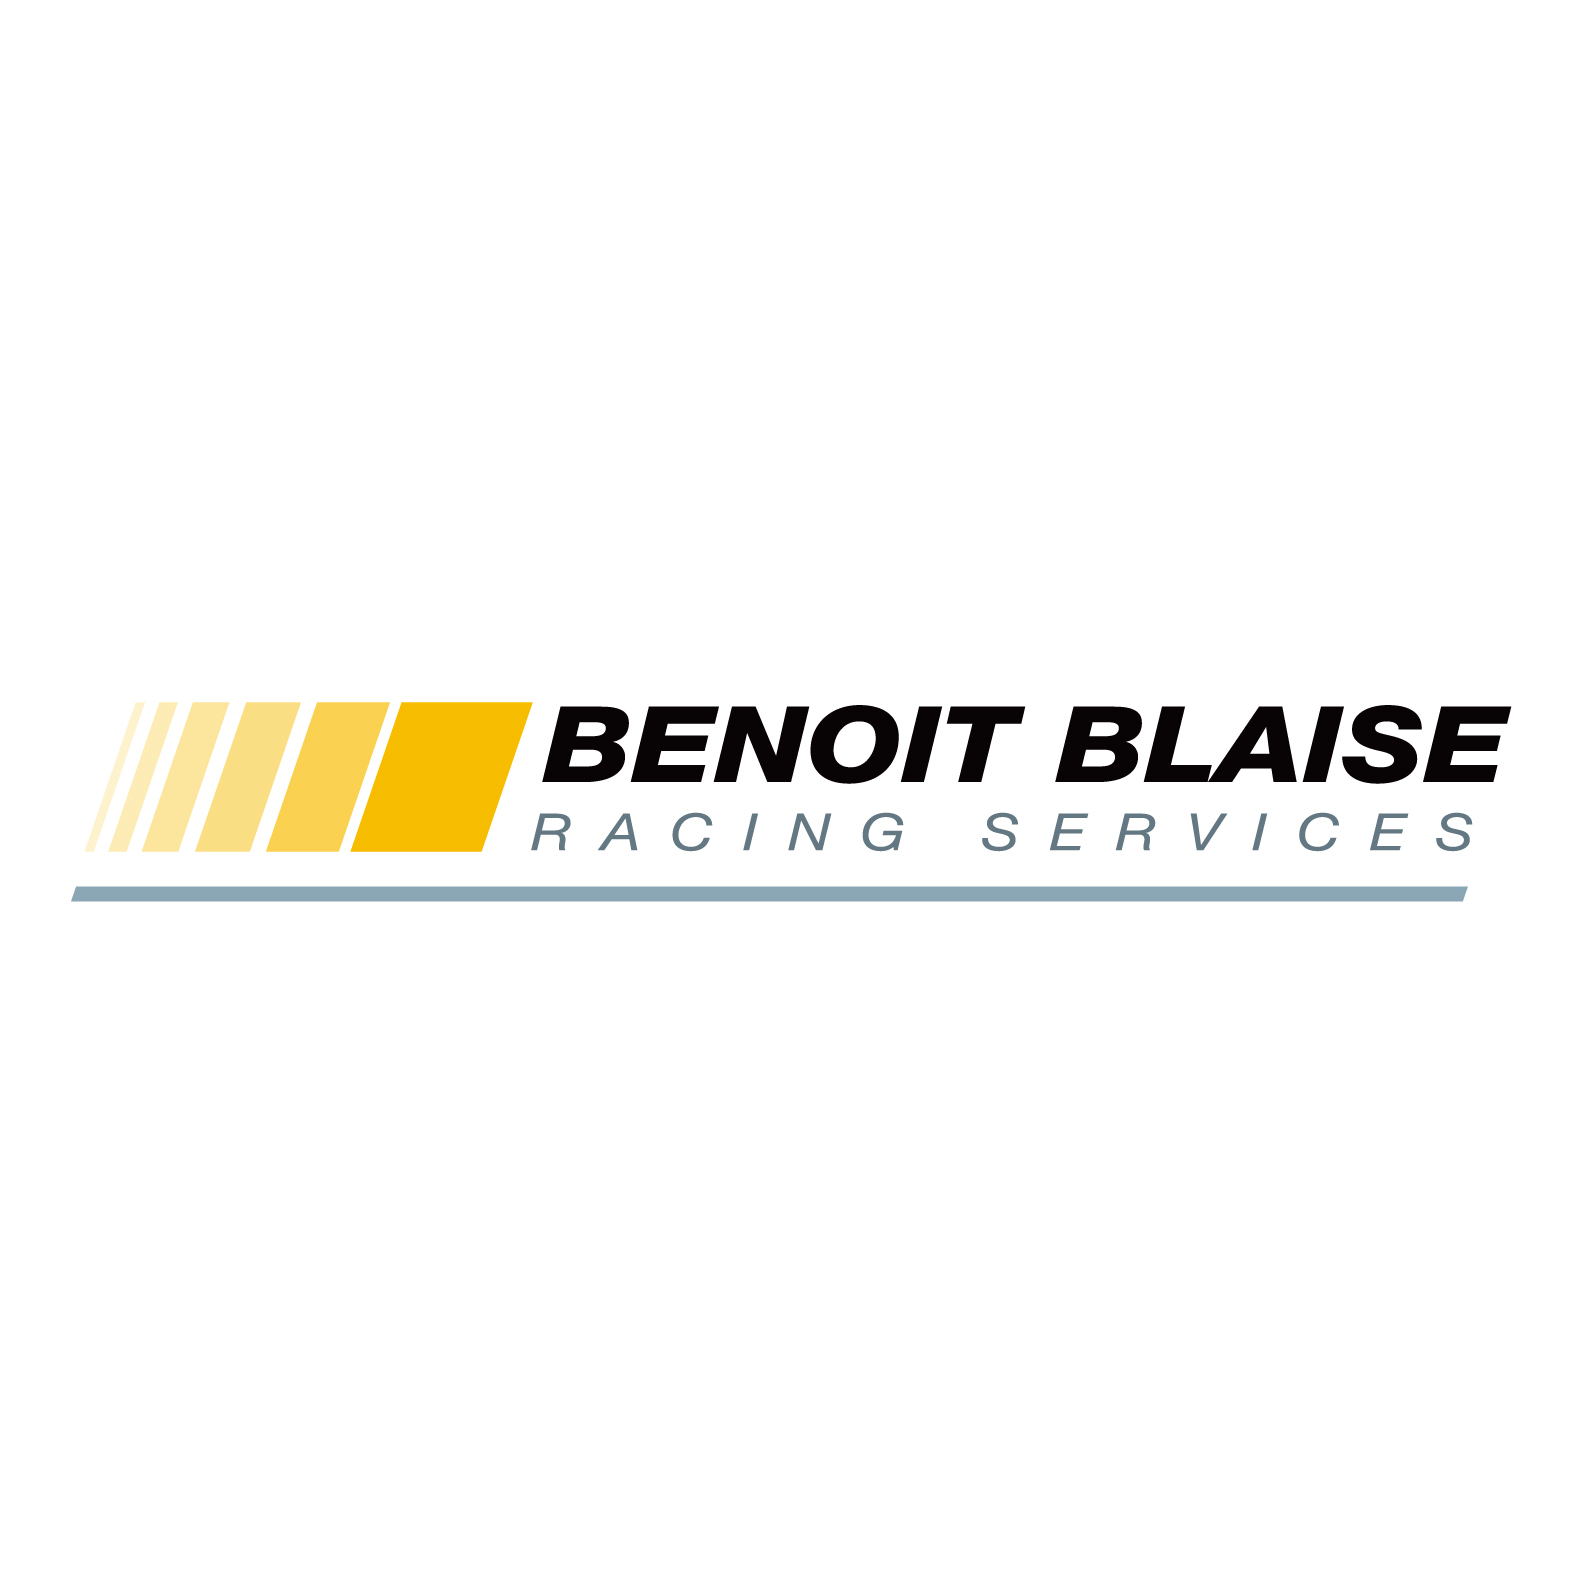 BLAISE SERVICE